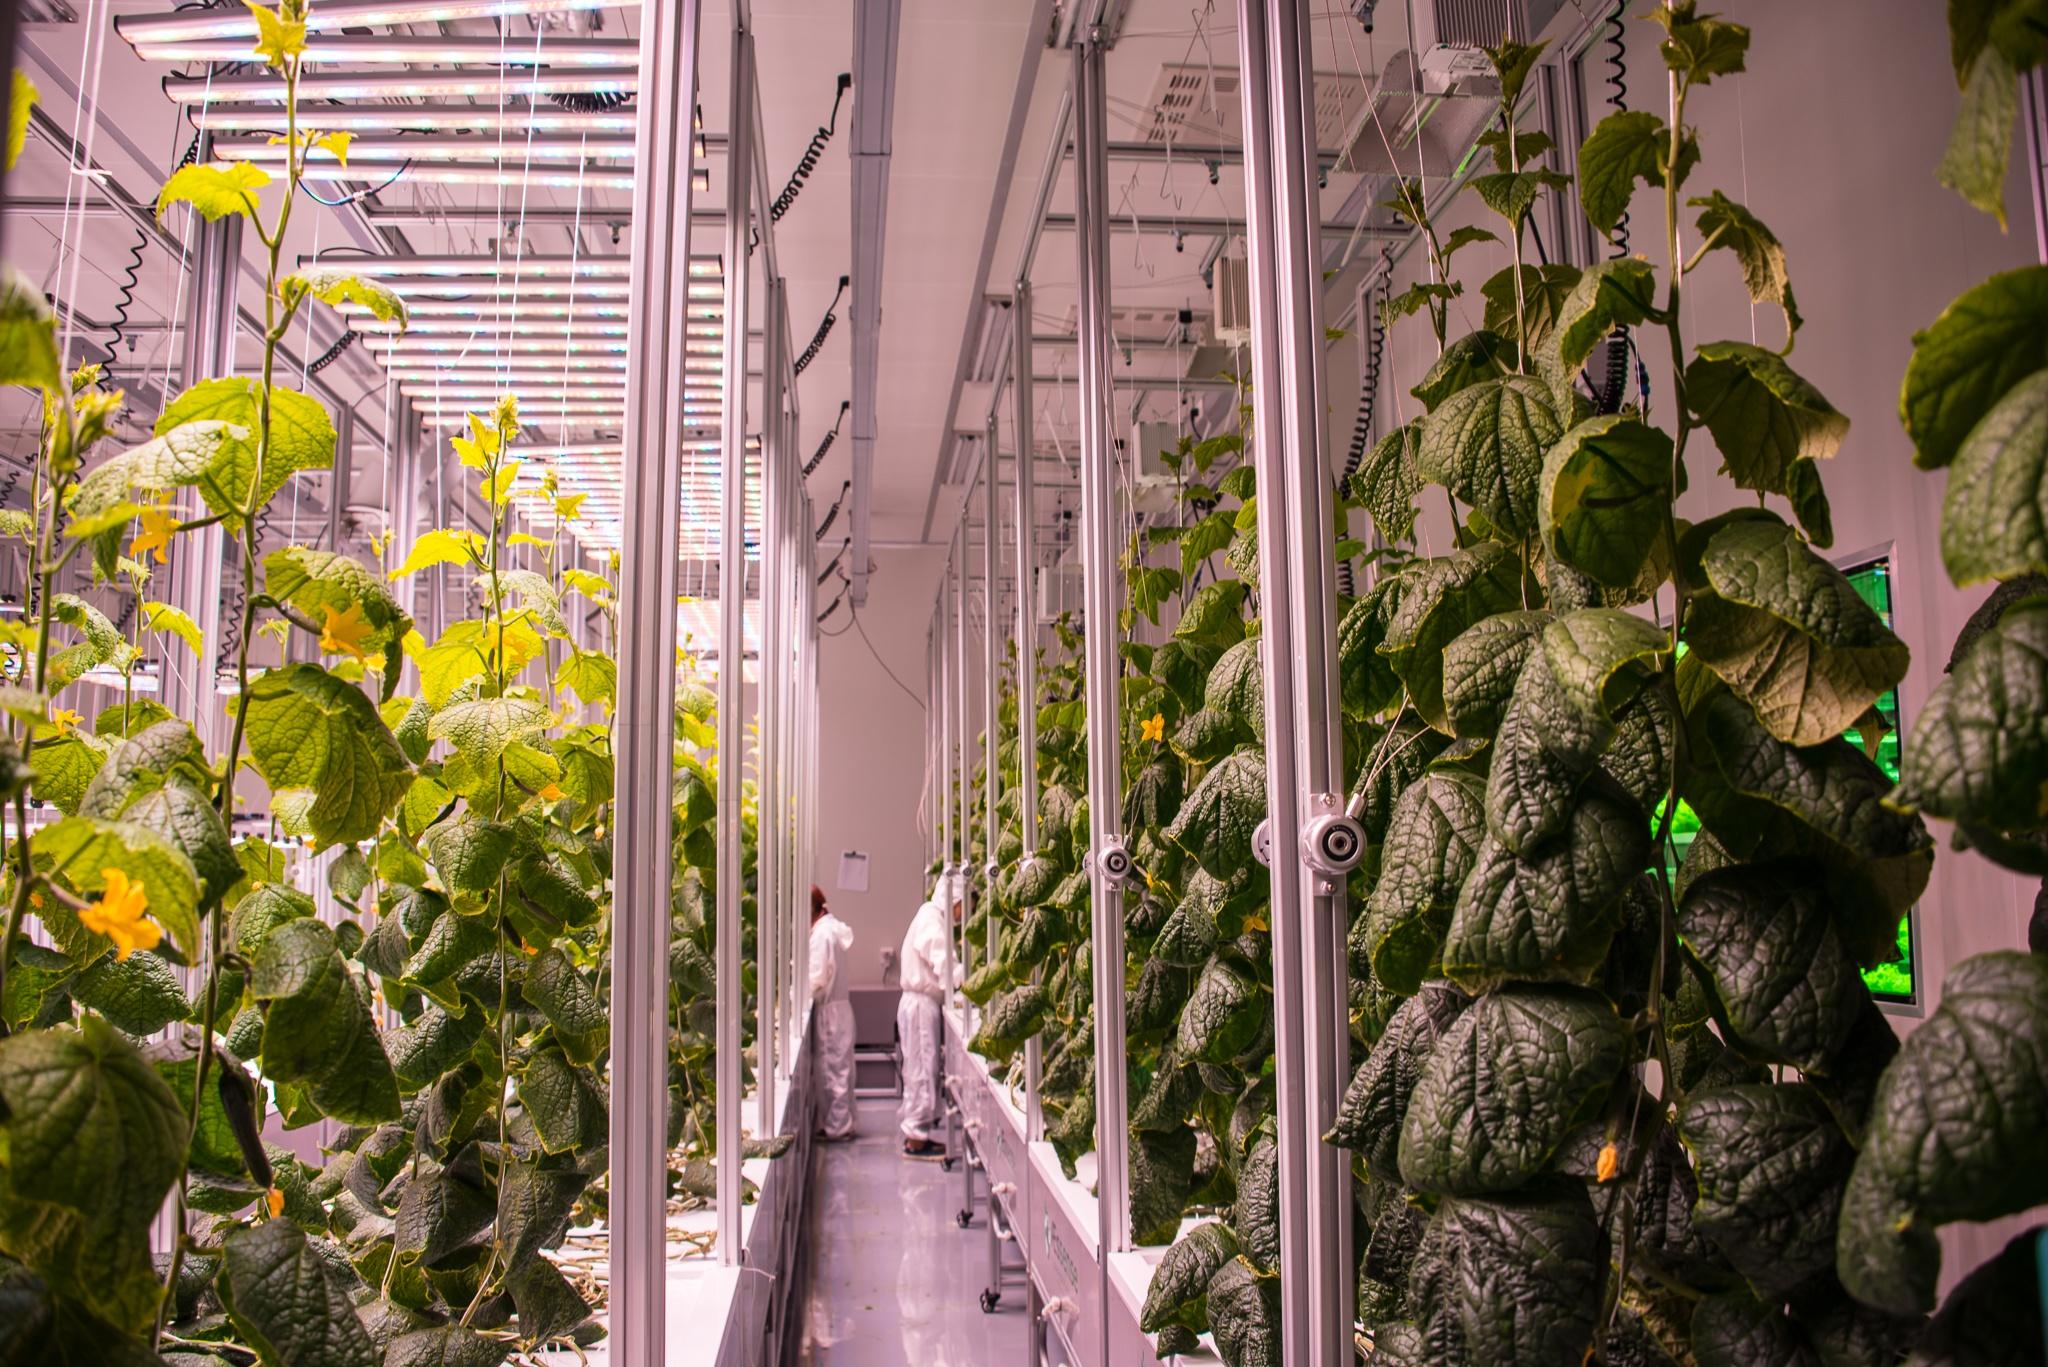 AEssenseGrows Fresh AEtrium-4 Tall Plant Harvest